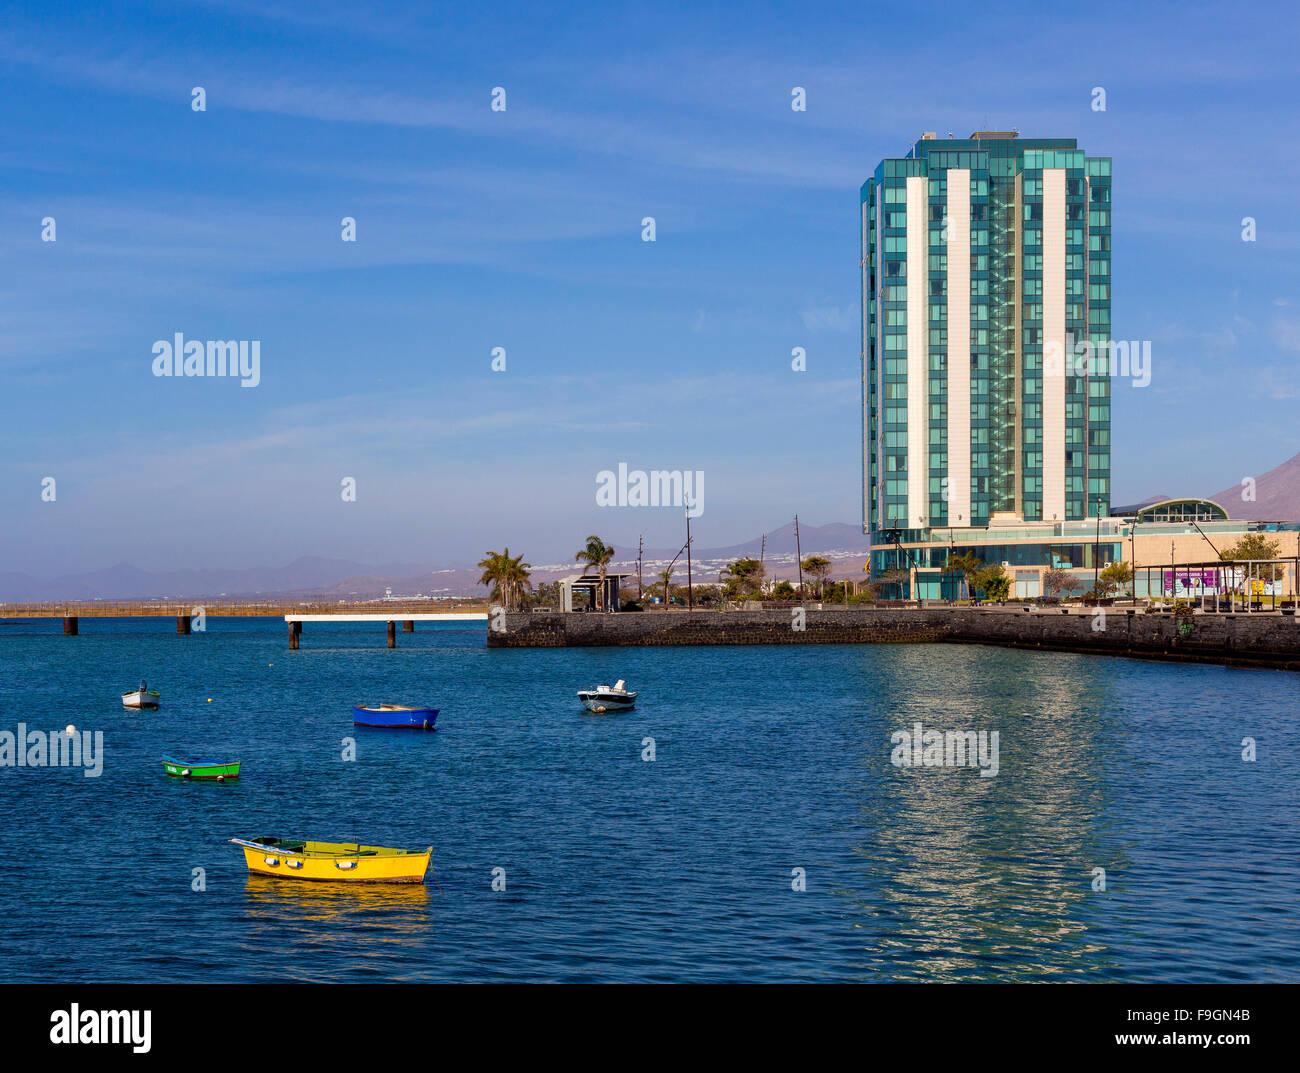 Gran Hotel Arrecife, Lanzarote, Kanarische Inseln, Spanien Stockfoto